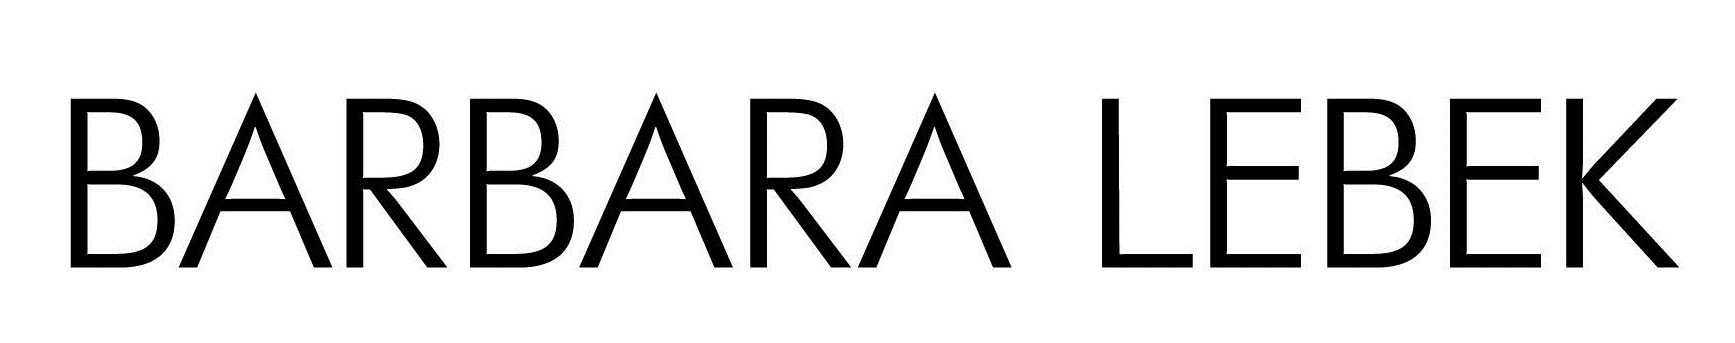 barbara-lebek-1